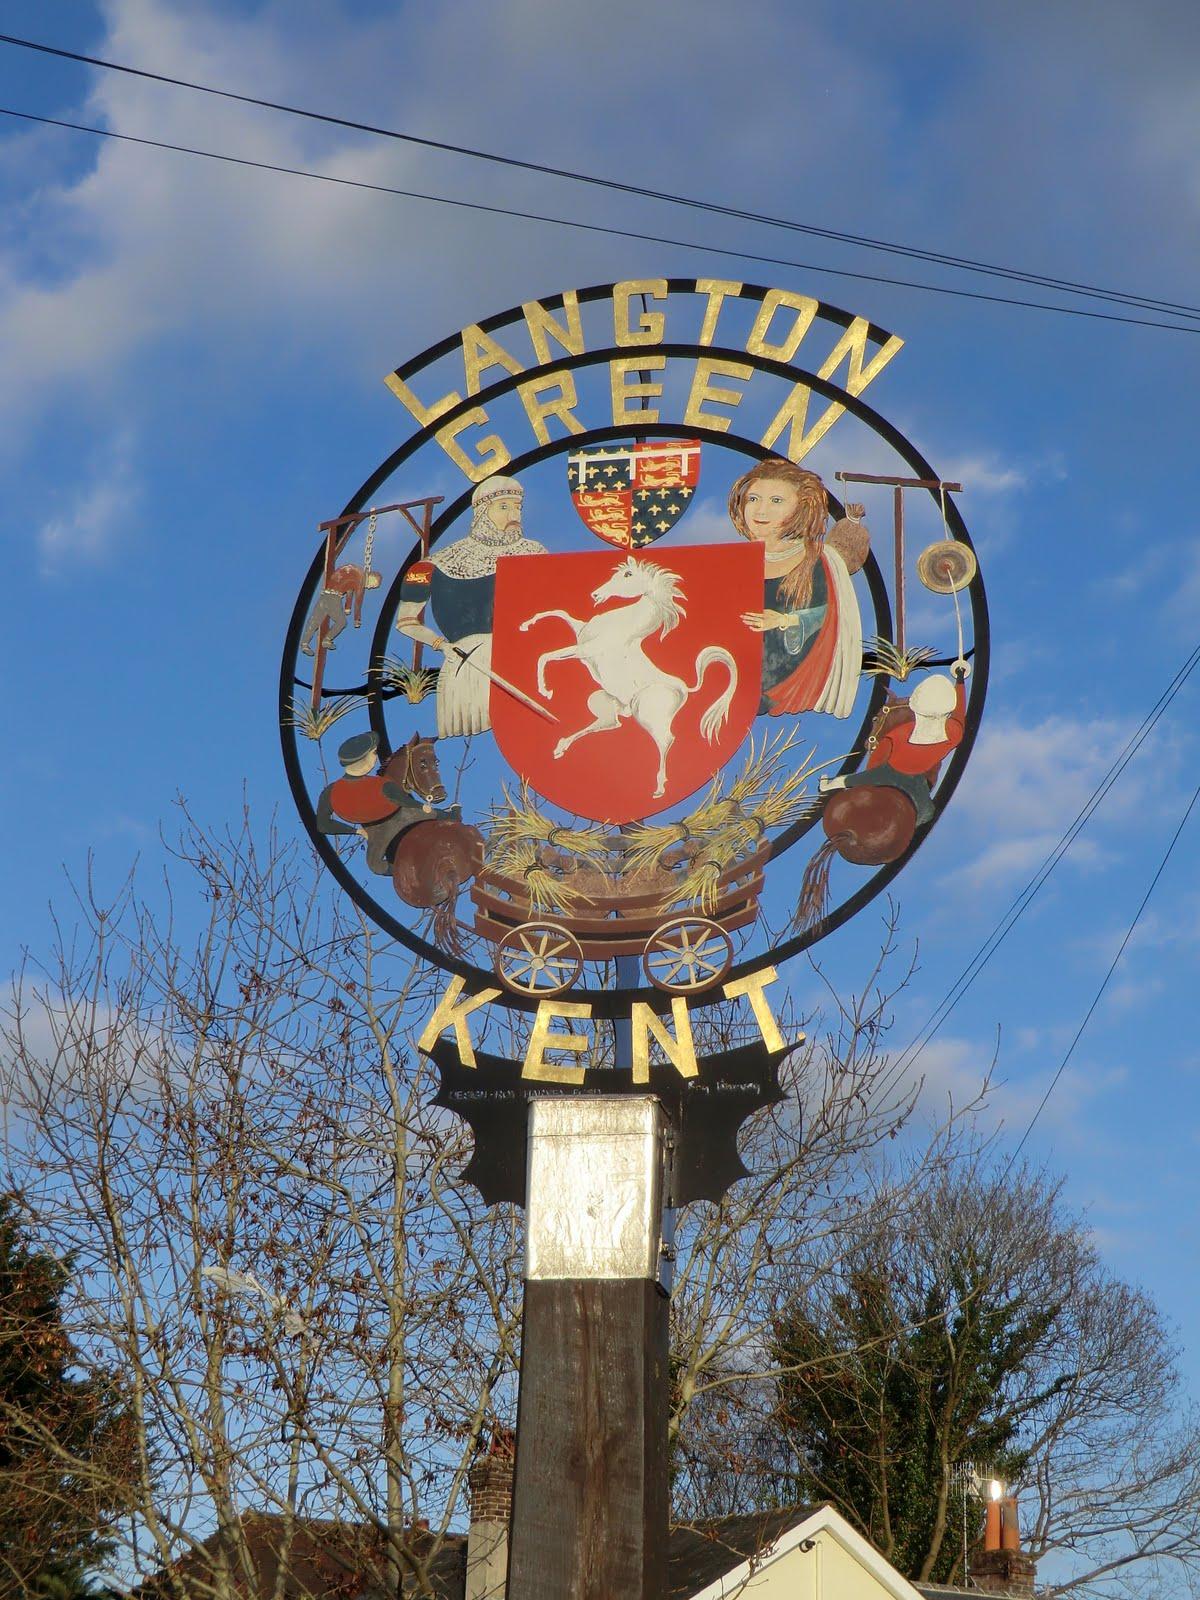 CIMG1744 Langton Green village sign